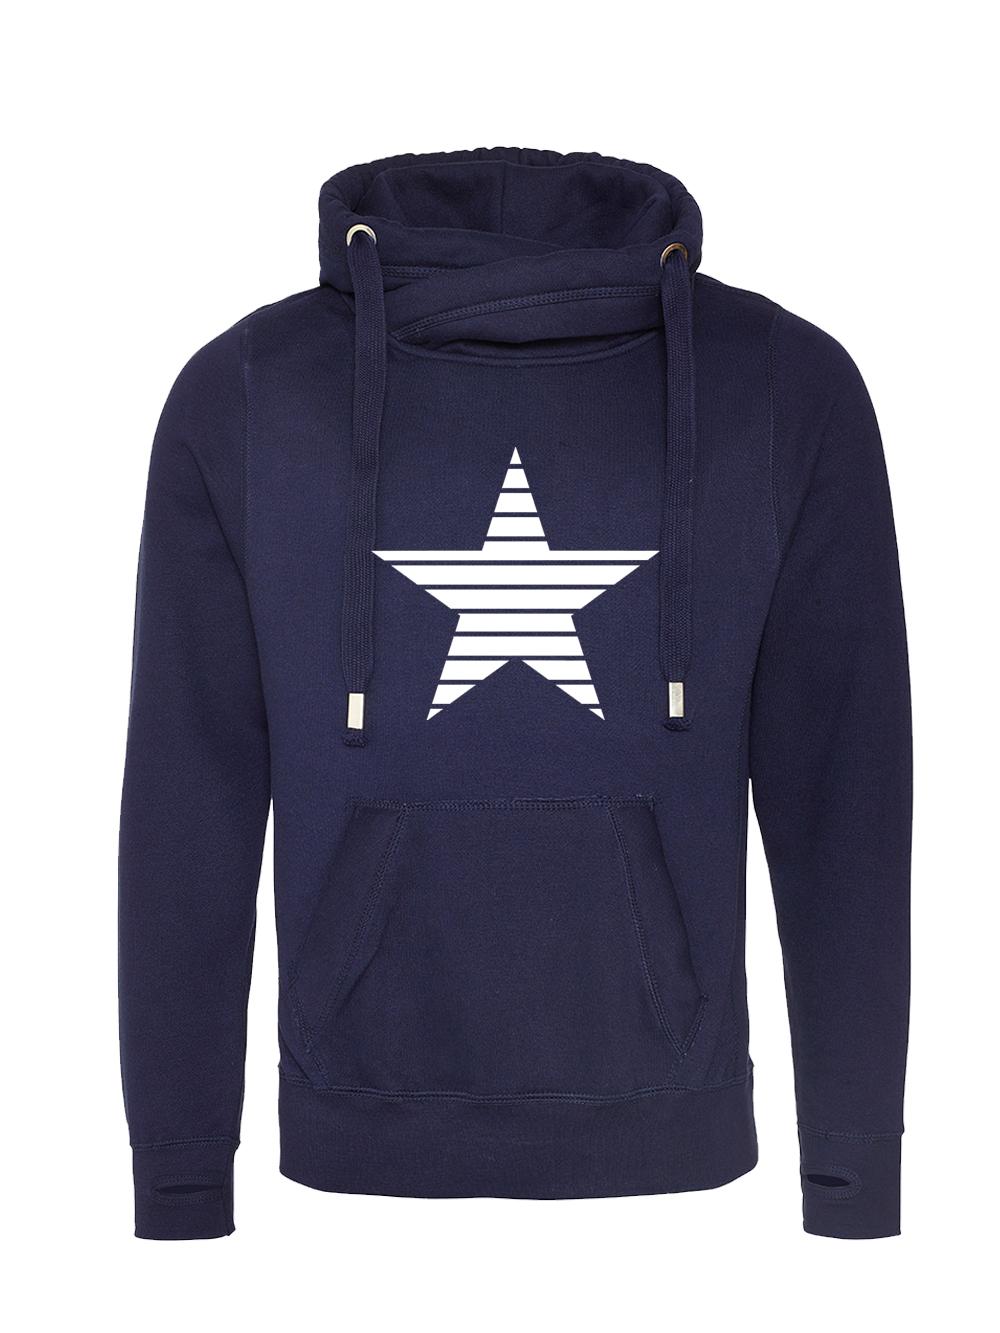 Stripe Star Cowl Neck Hooded Jumper